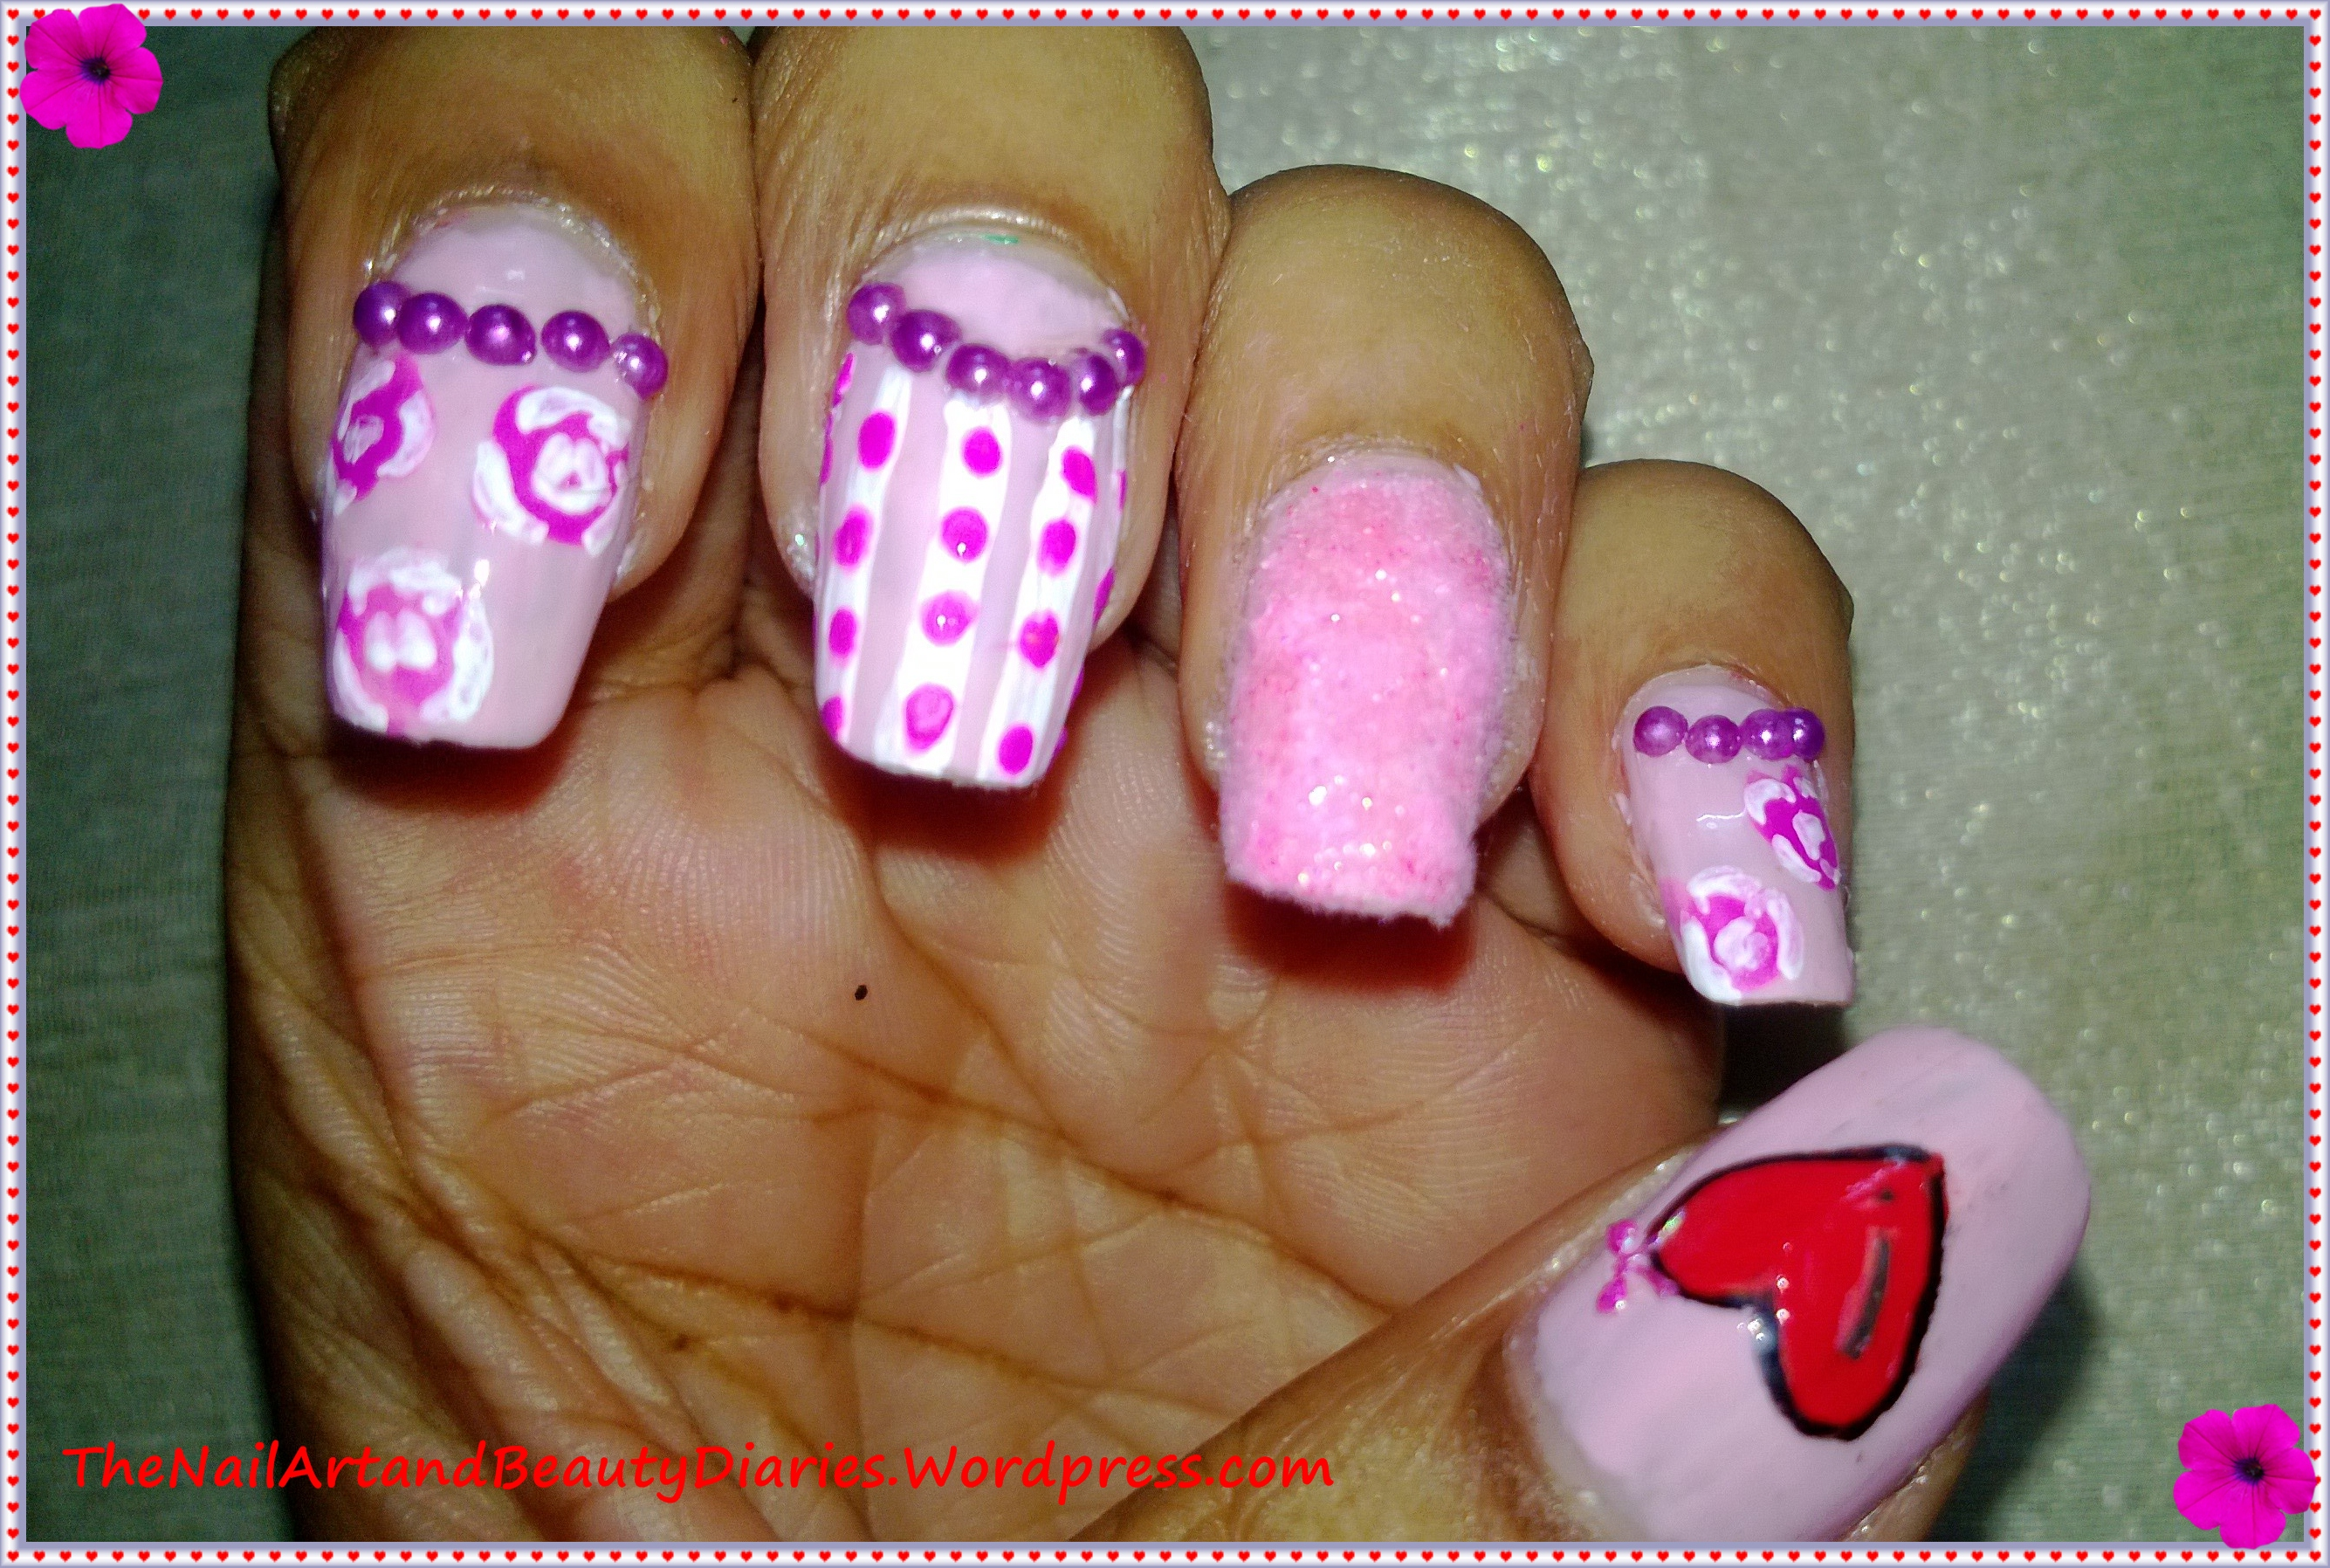 The myself nail art the nail art and beauty diaries the myself nail art solutioingenieria Gallery